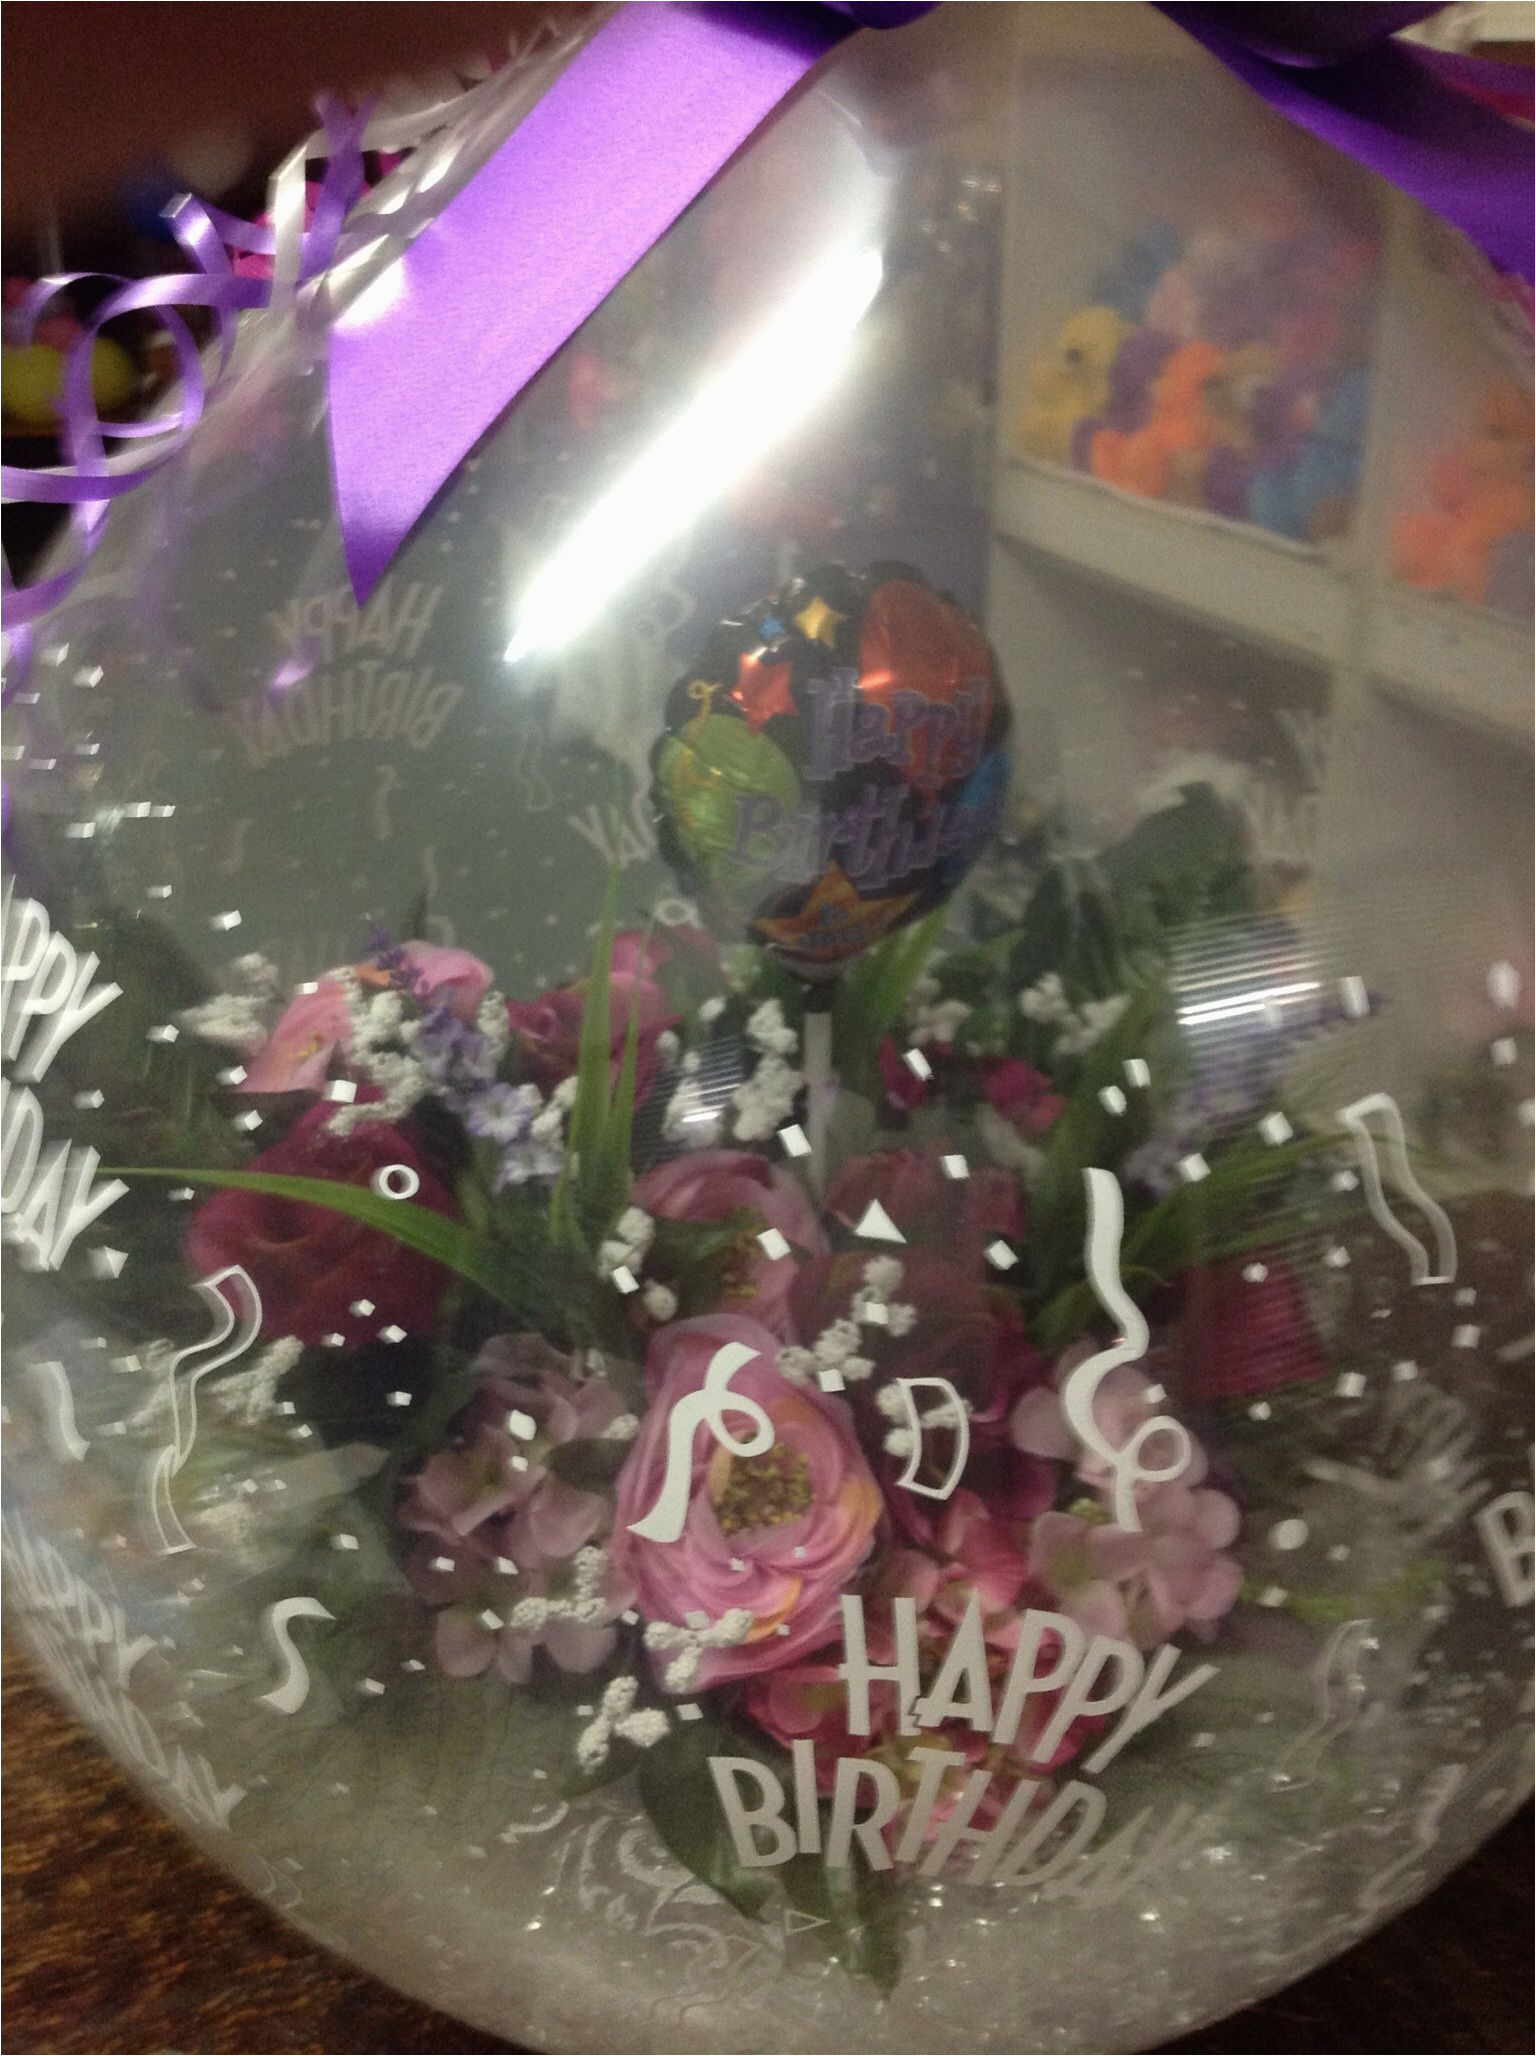 Happy 50th Birthday Flowers 50th Birthday Flower Bouquet Stuffed Balloon Cre8iv